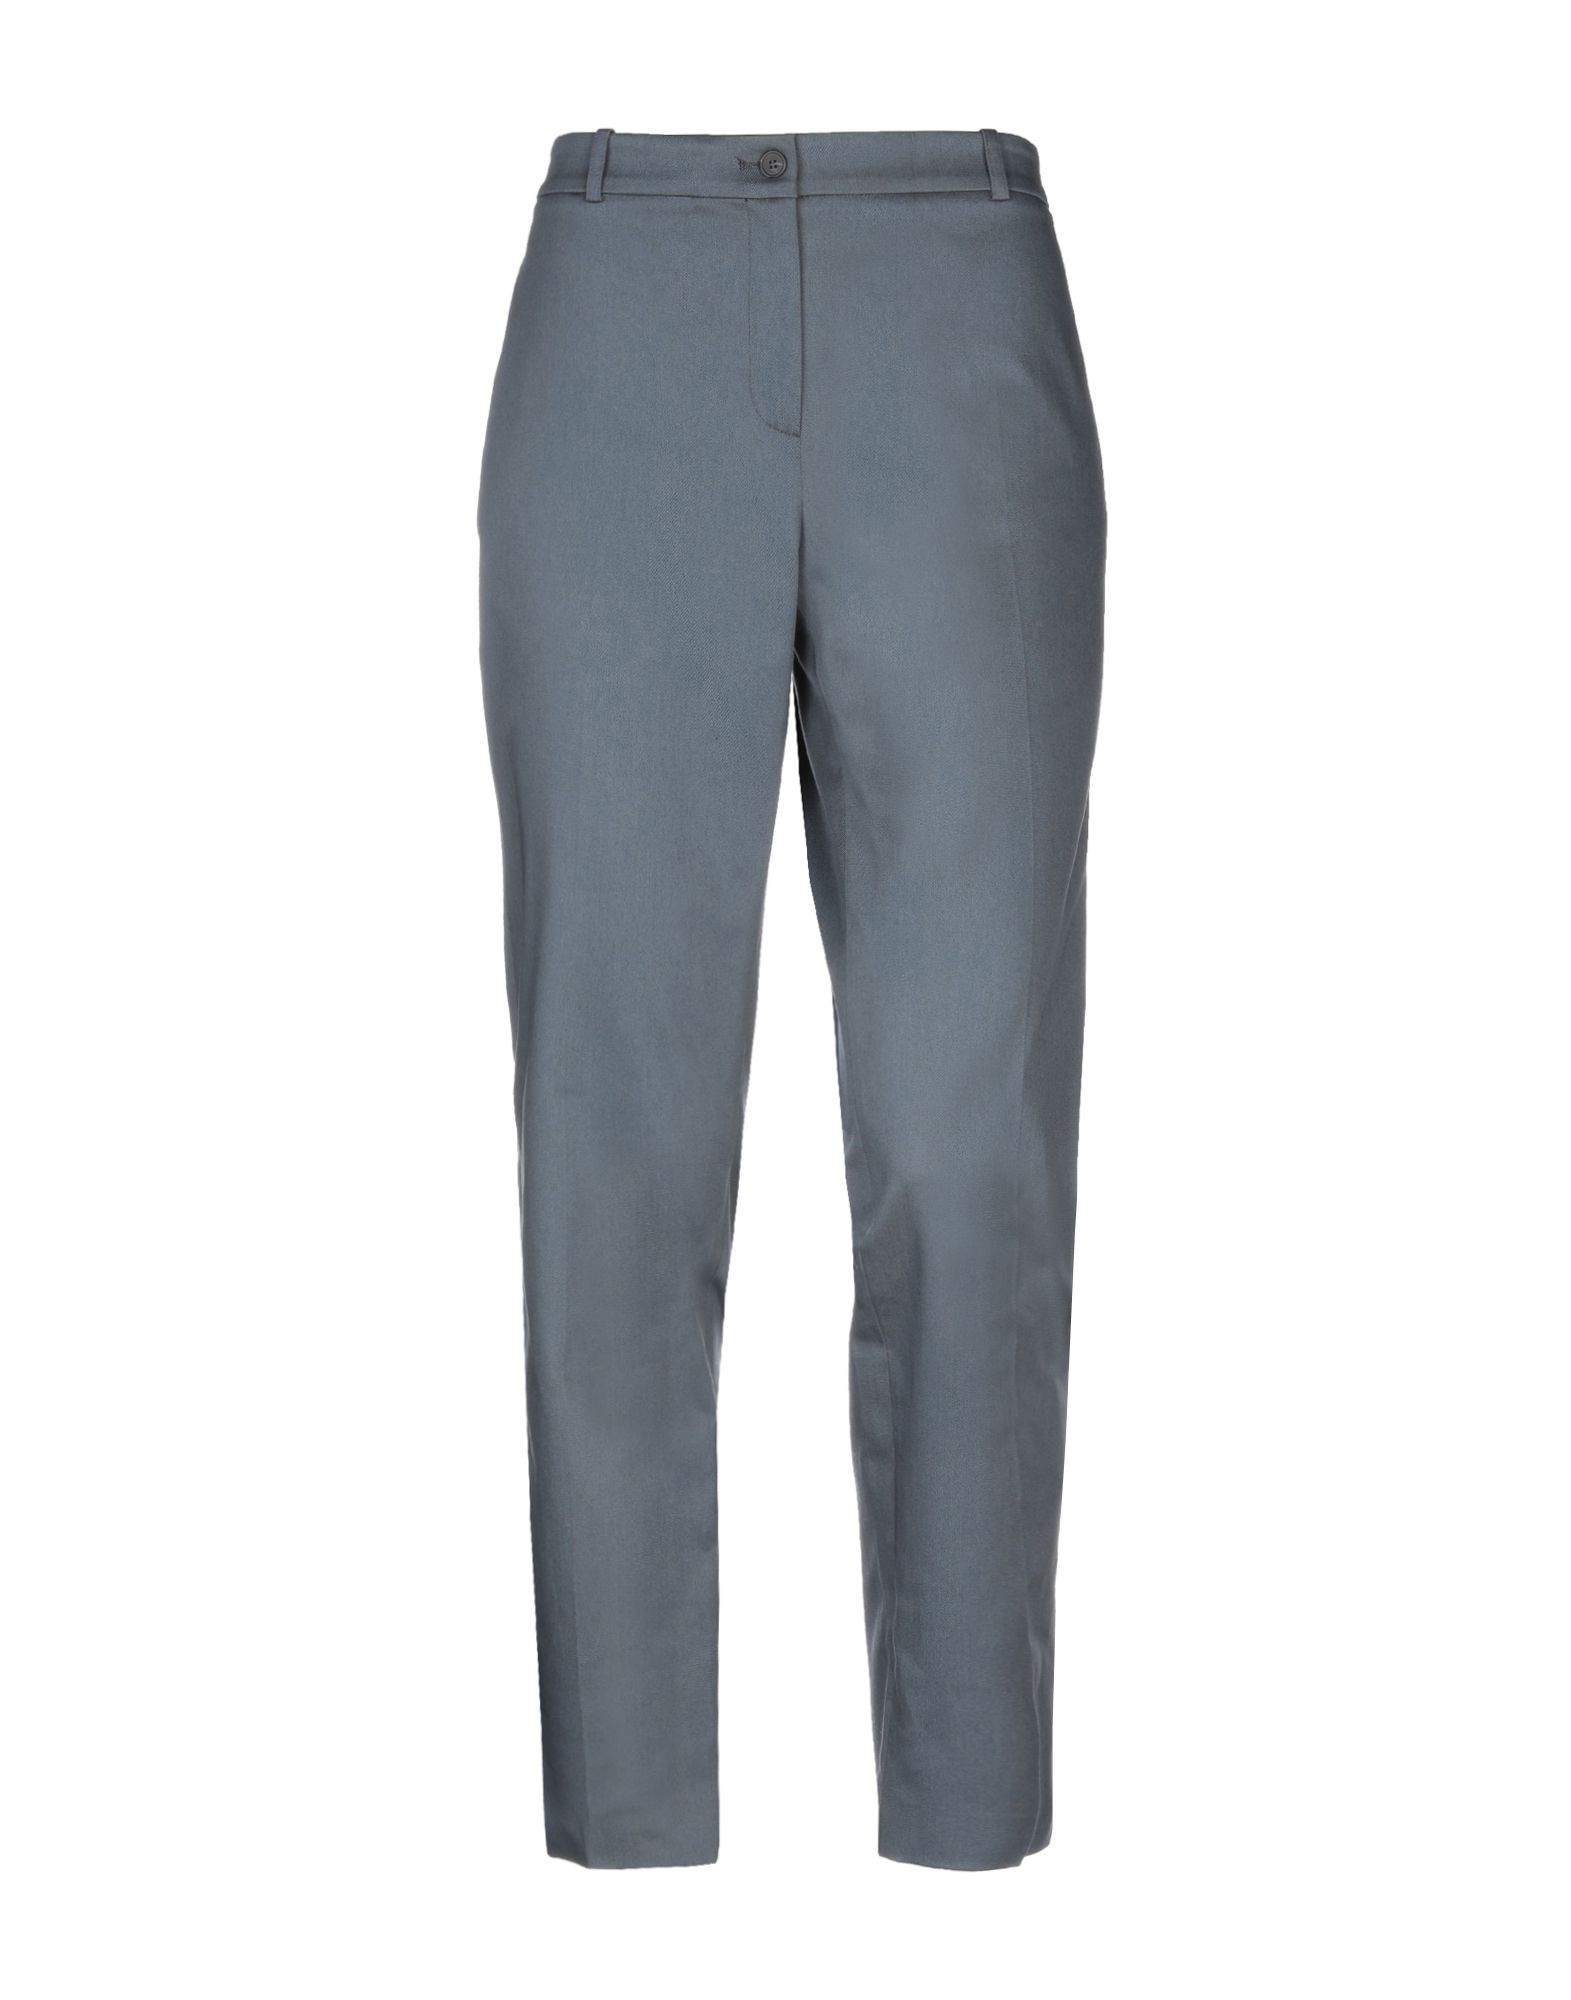 Фото - JIL SANDER NAVY Повседневные брюки active cut out elastic vest in navy